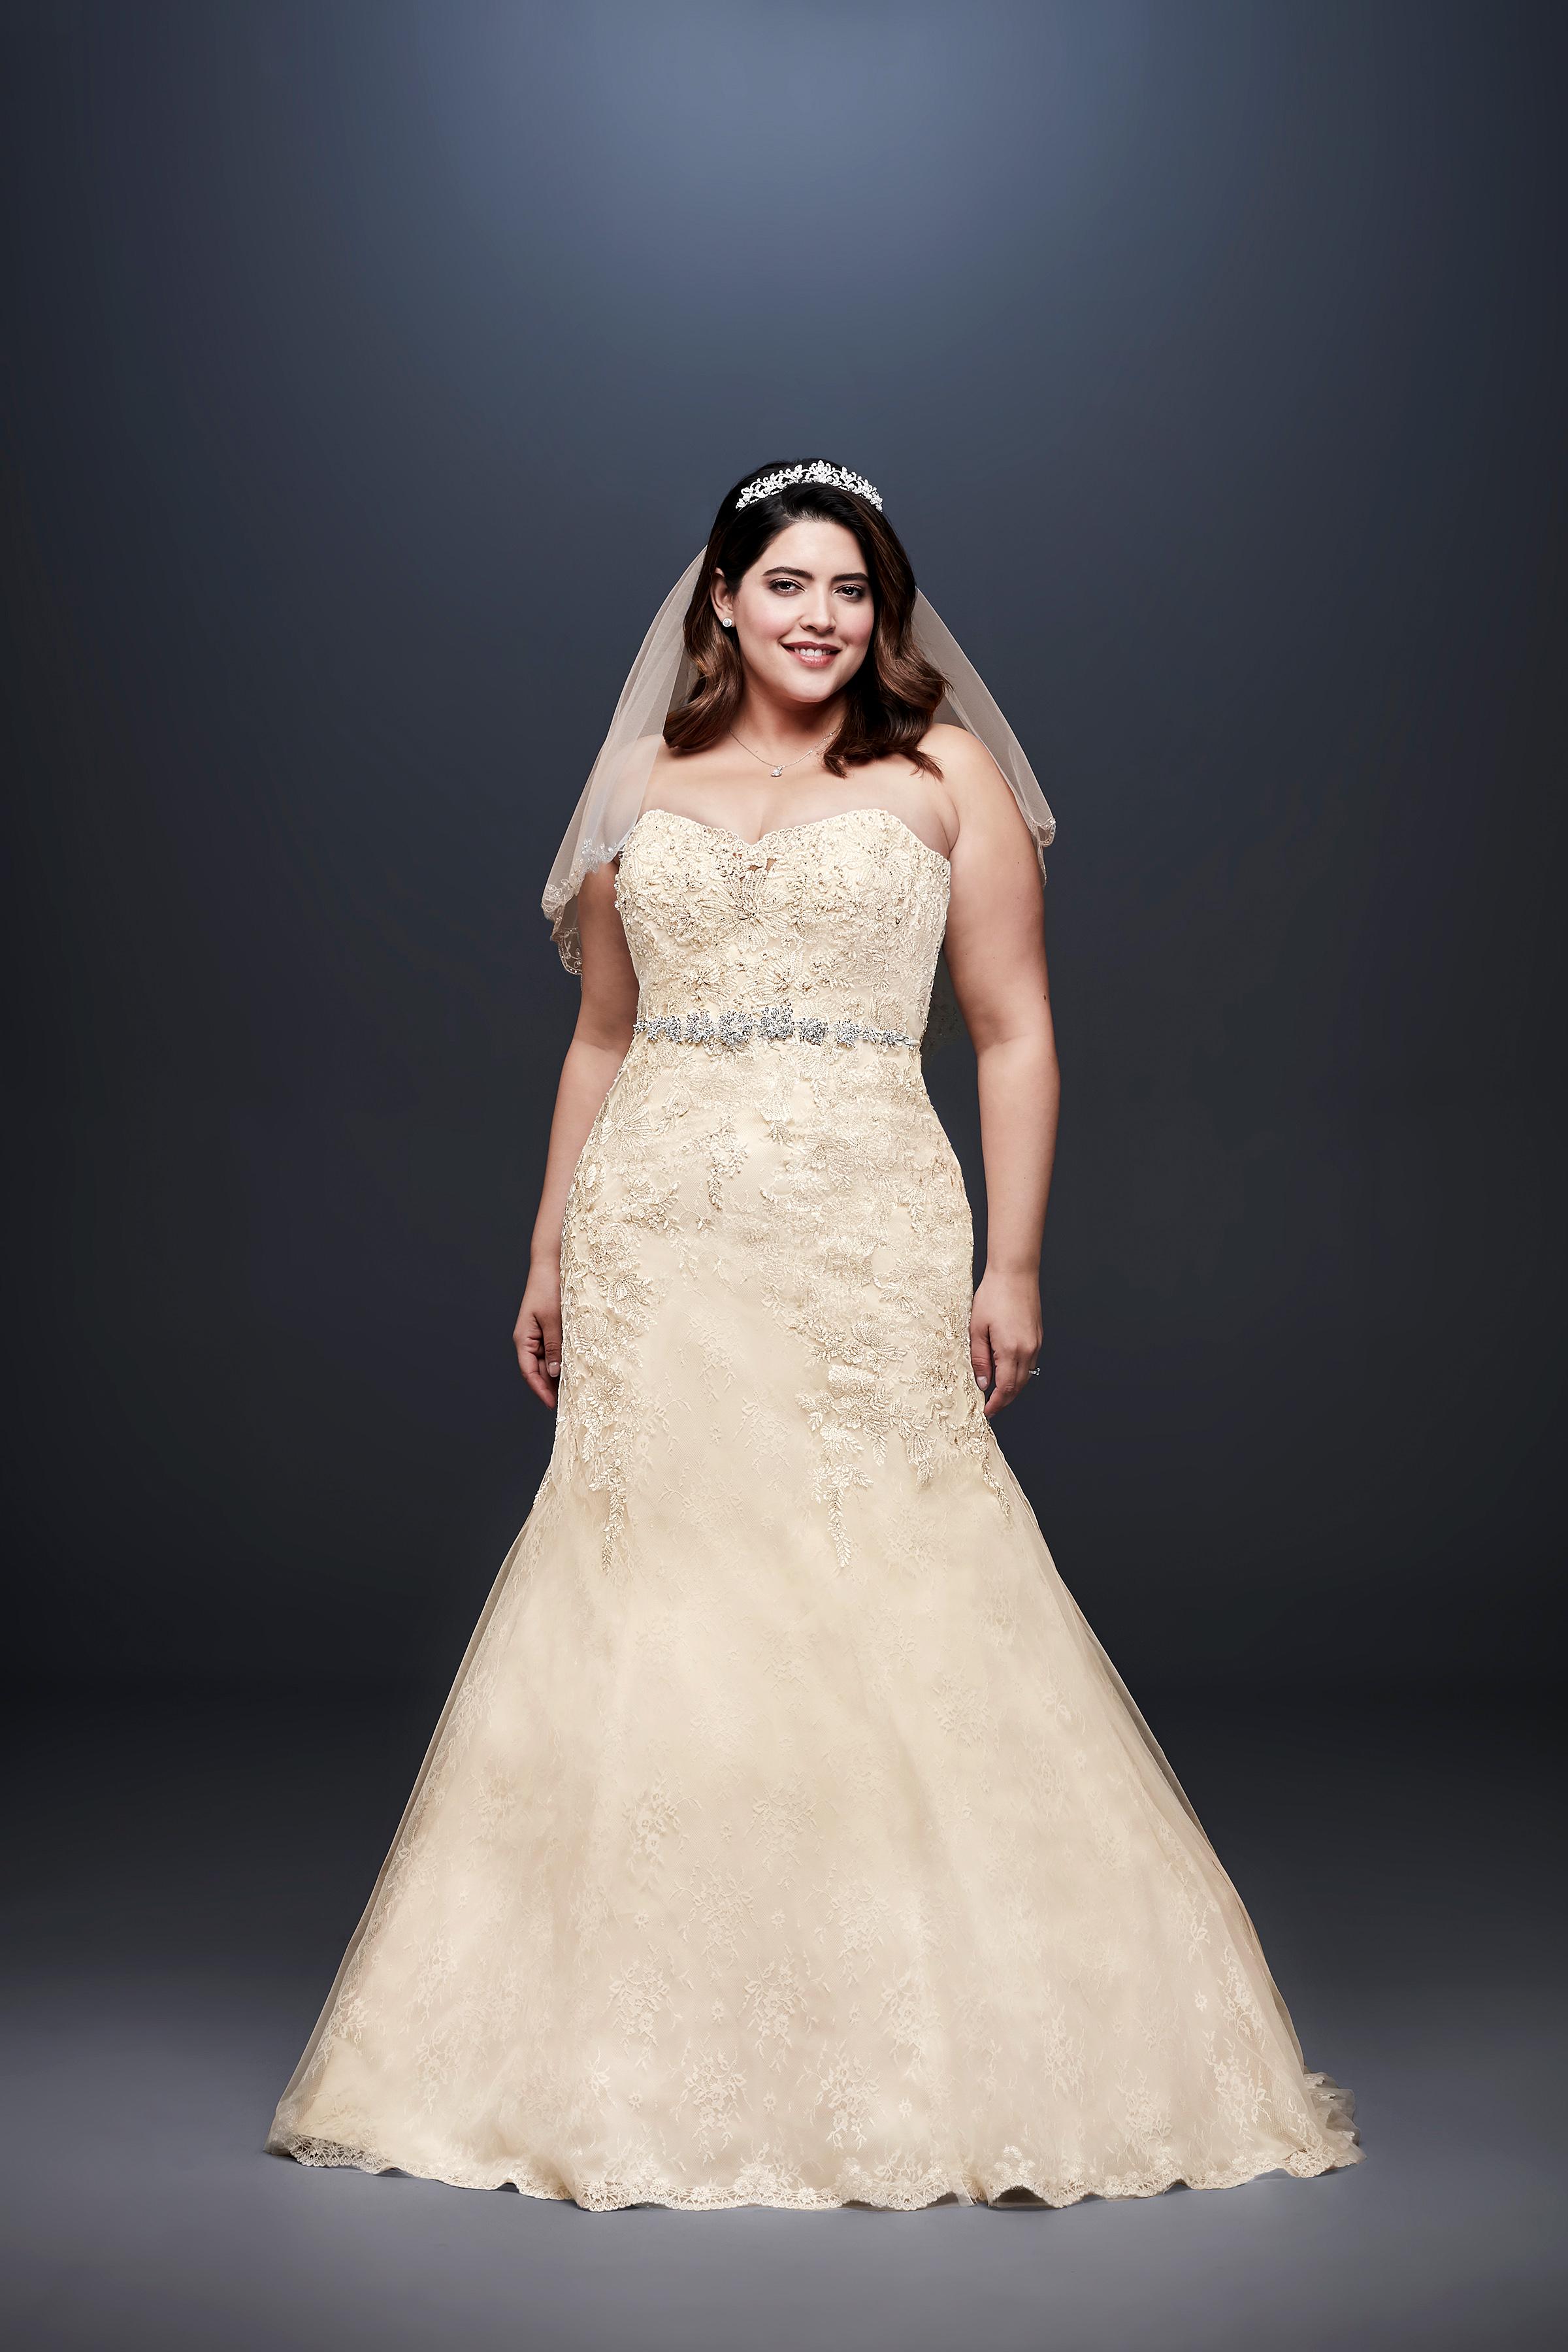 david bridal wedding dress spring 2019 gold trumpet strapless beaded belt